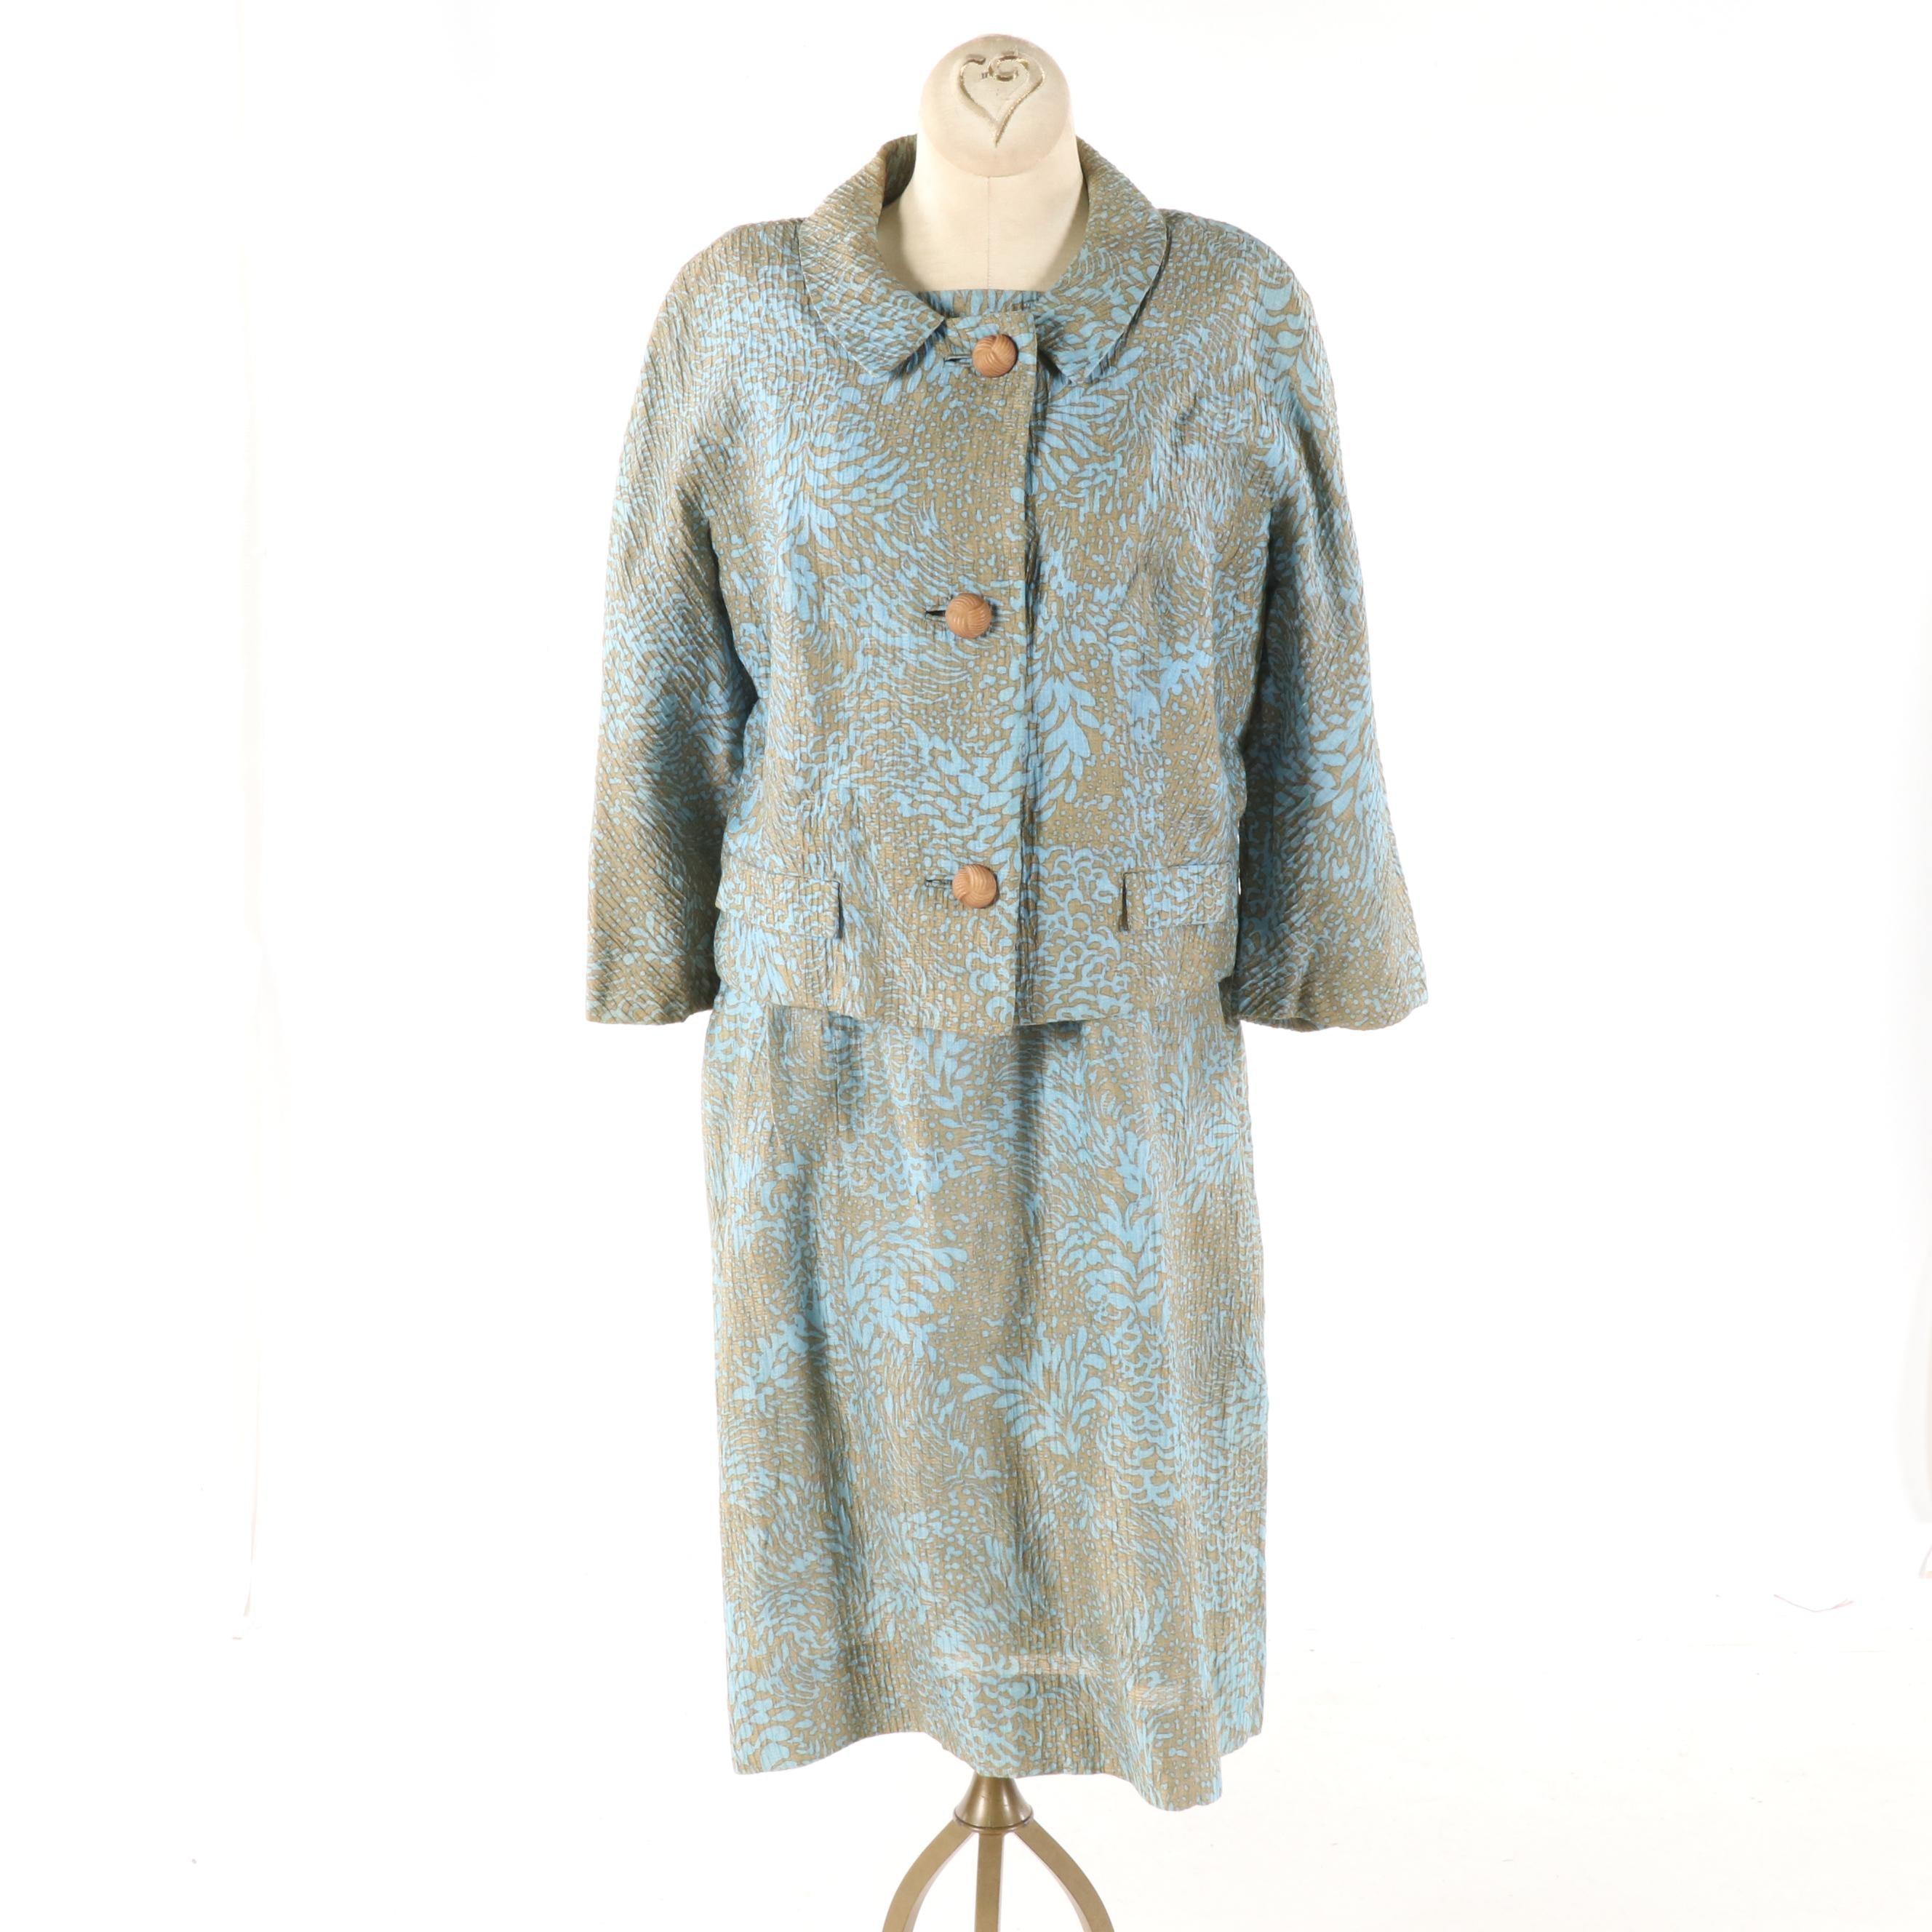 Women's 1960s Vintage Bergdorf Goodman Silk Floral Print Dress Suit